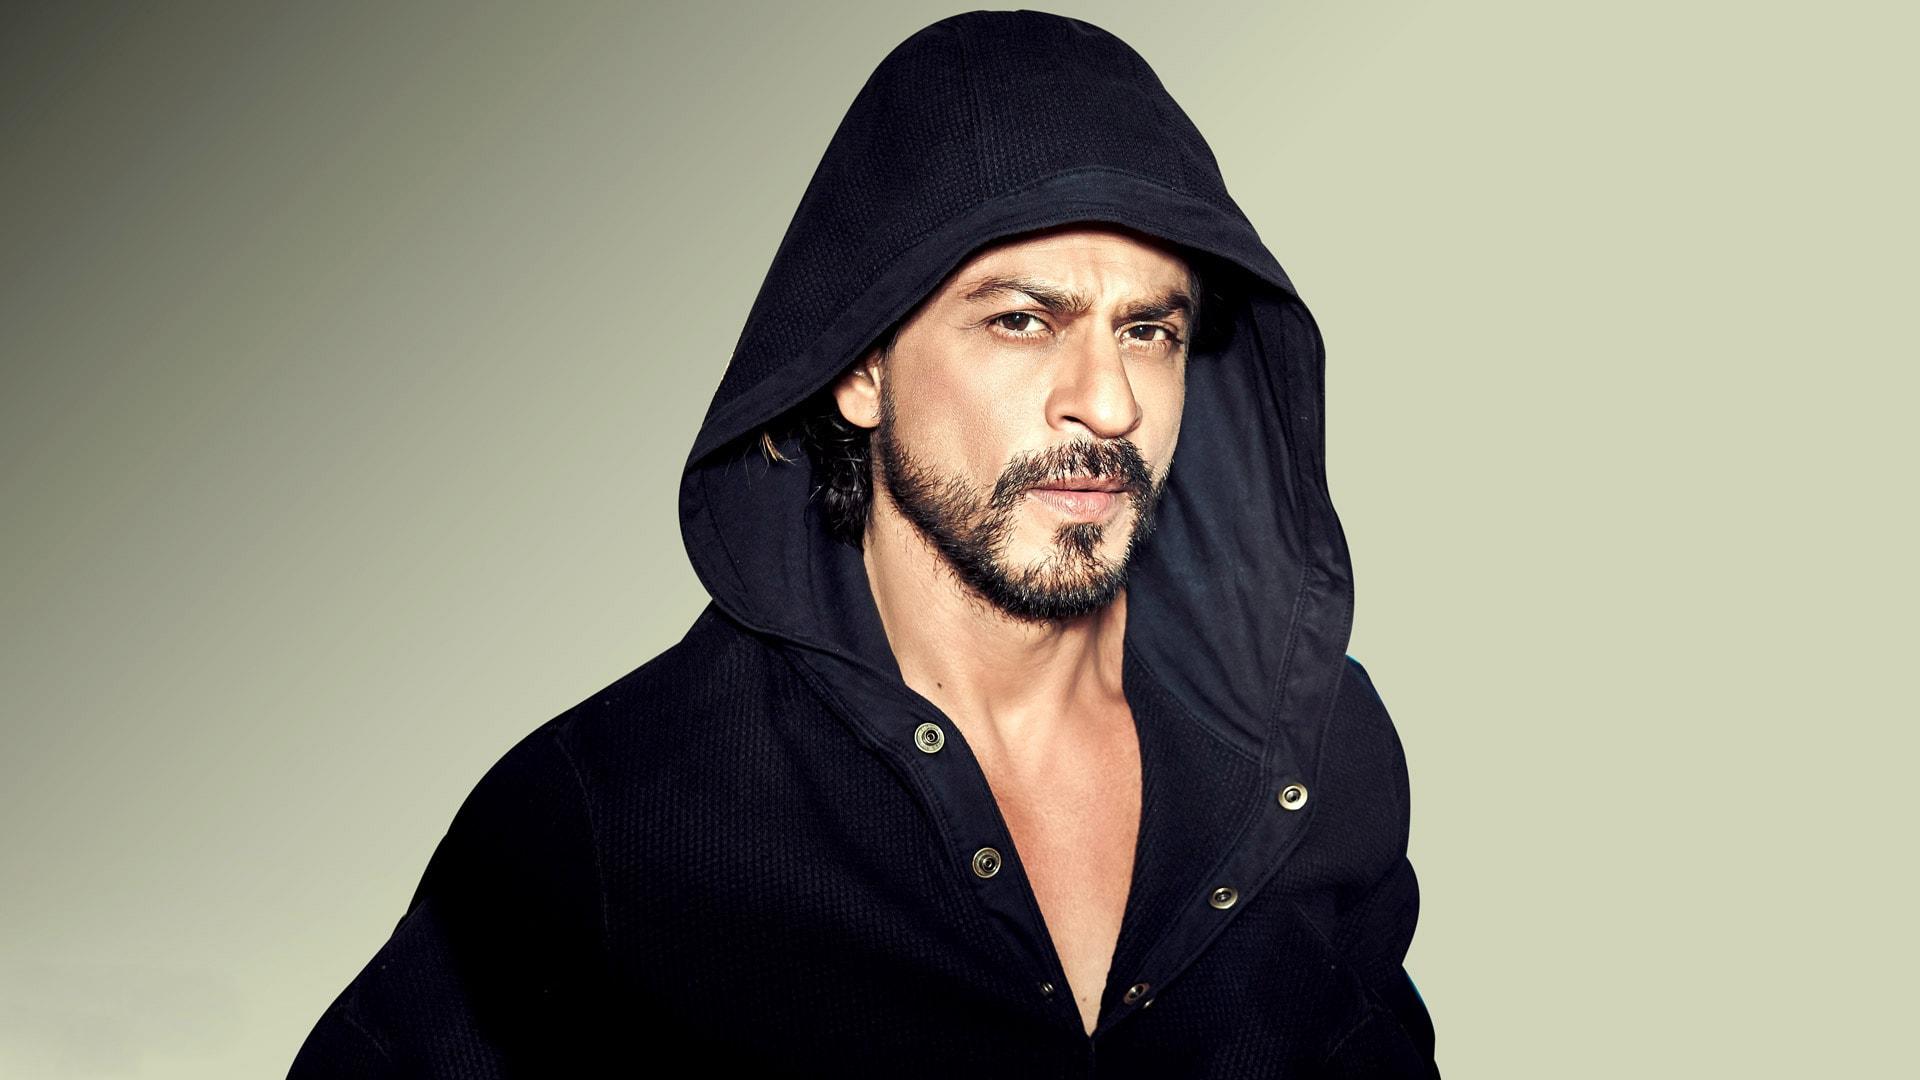 Shah Rukh Khan HQ wallpapers